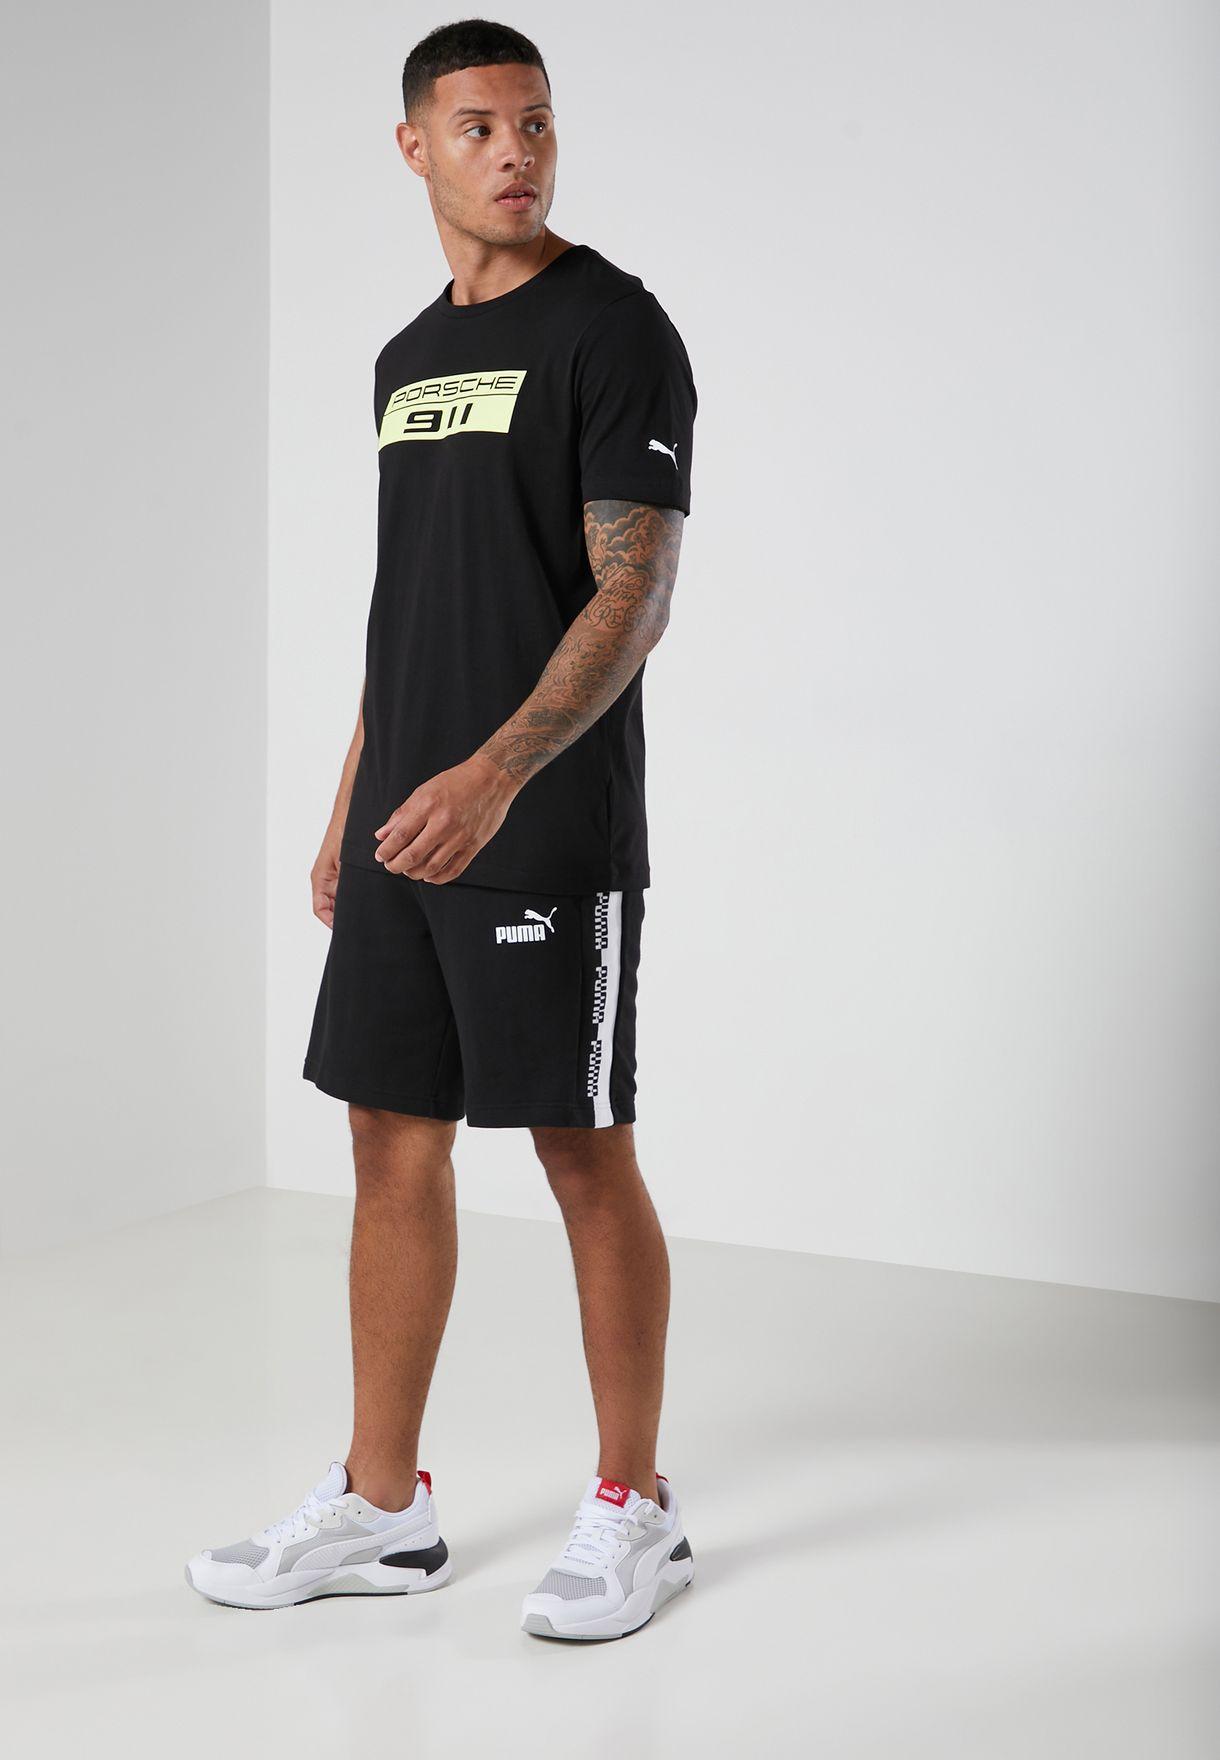 AMPLIFIED men shorts